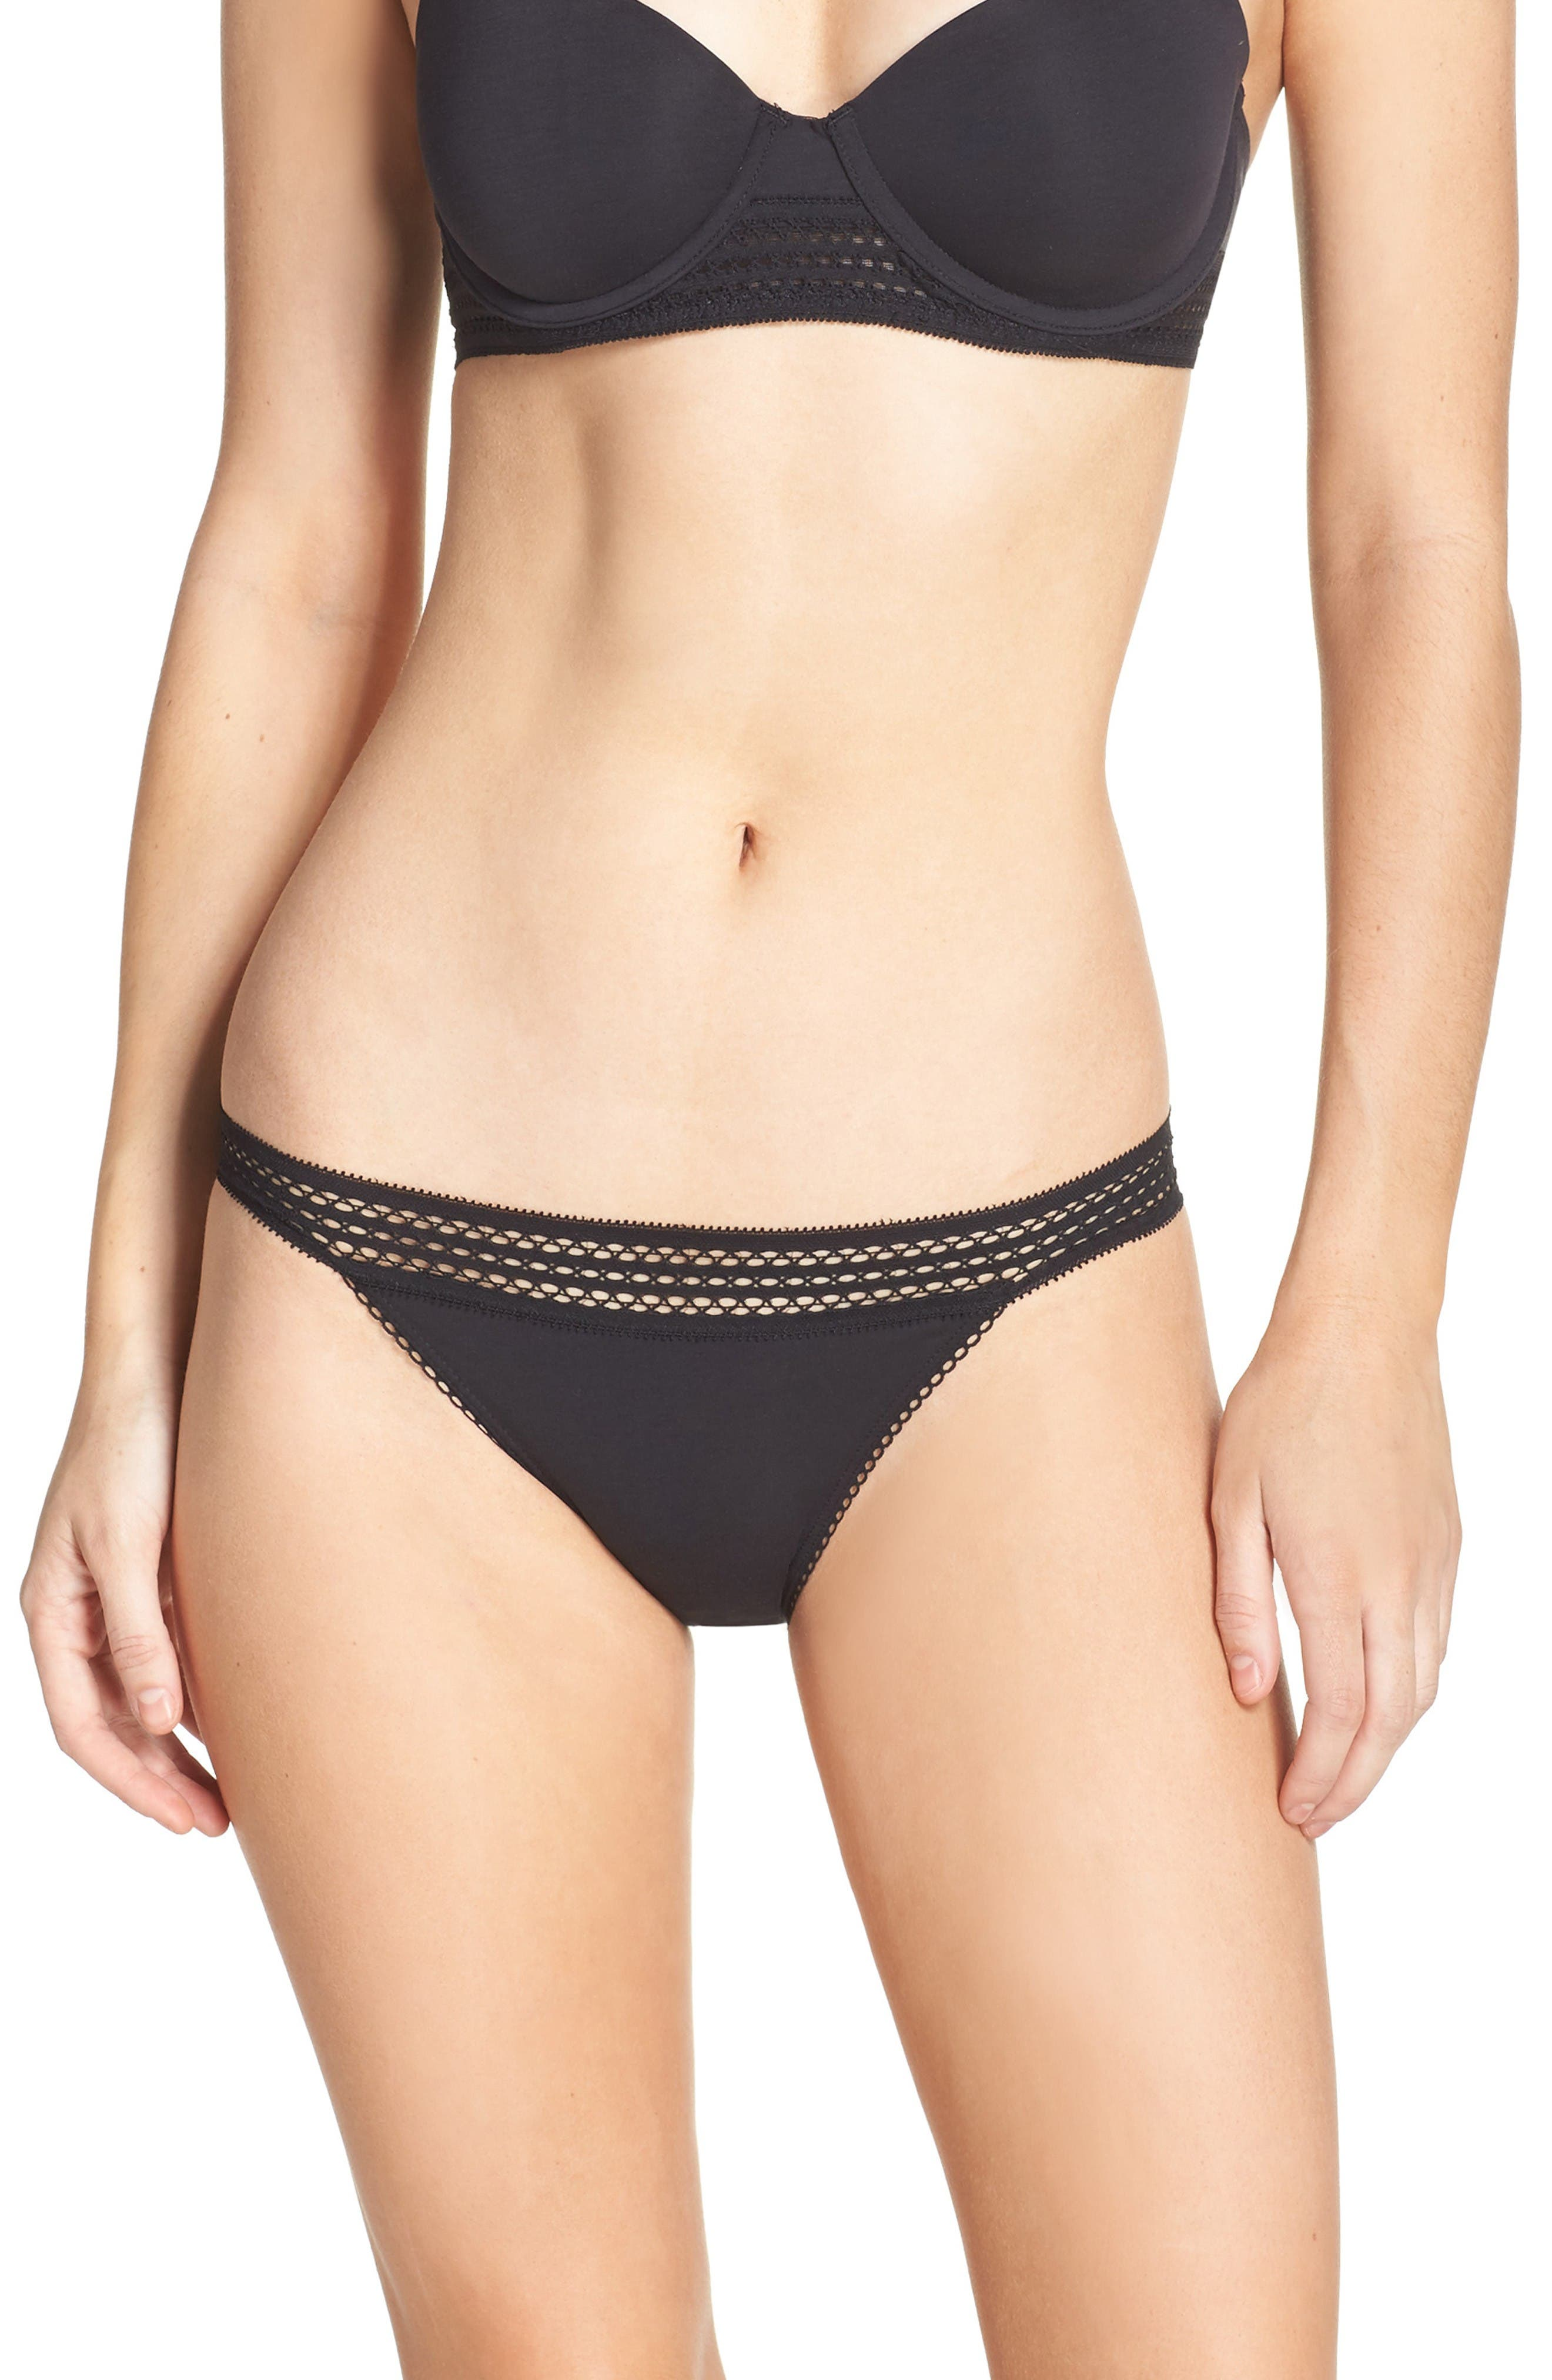 DKNY Bikini (4 for $30)